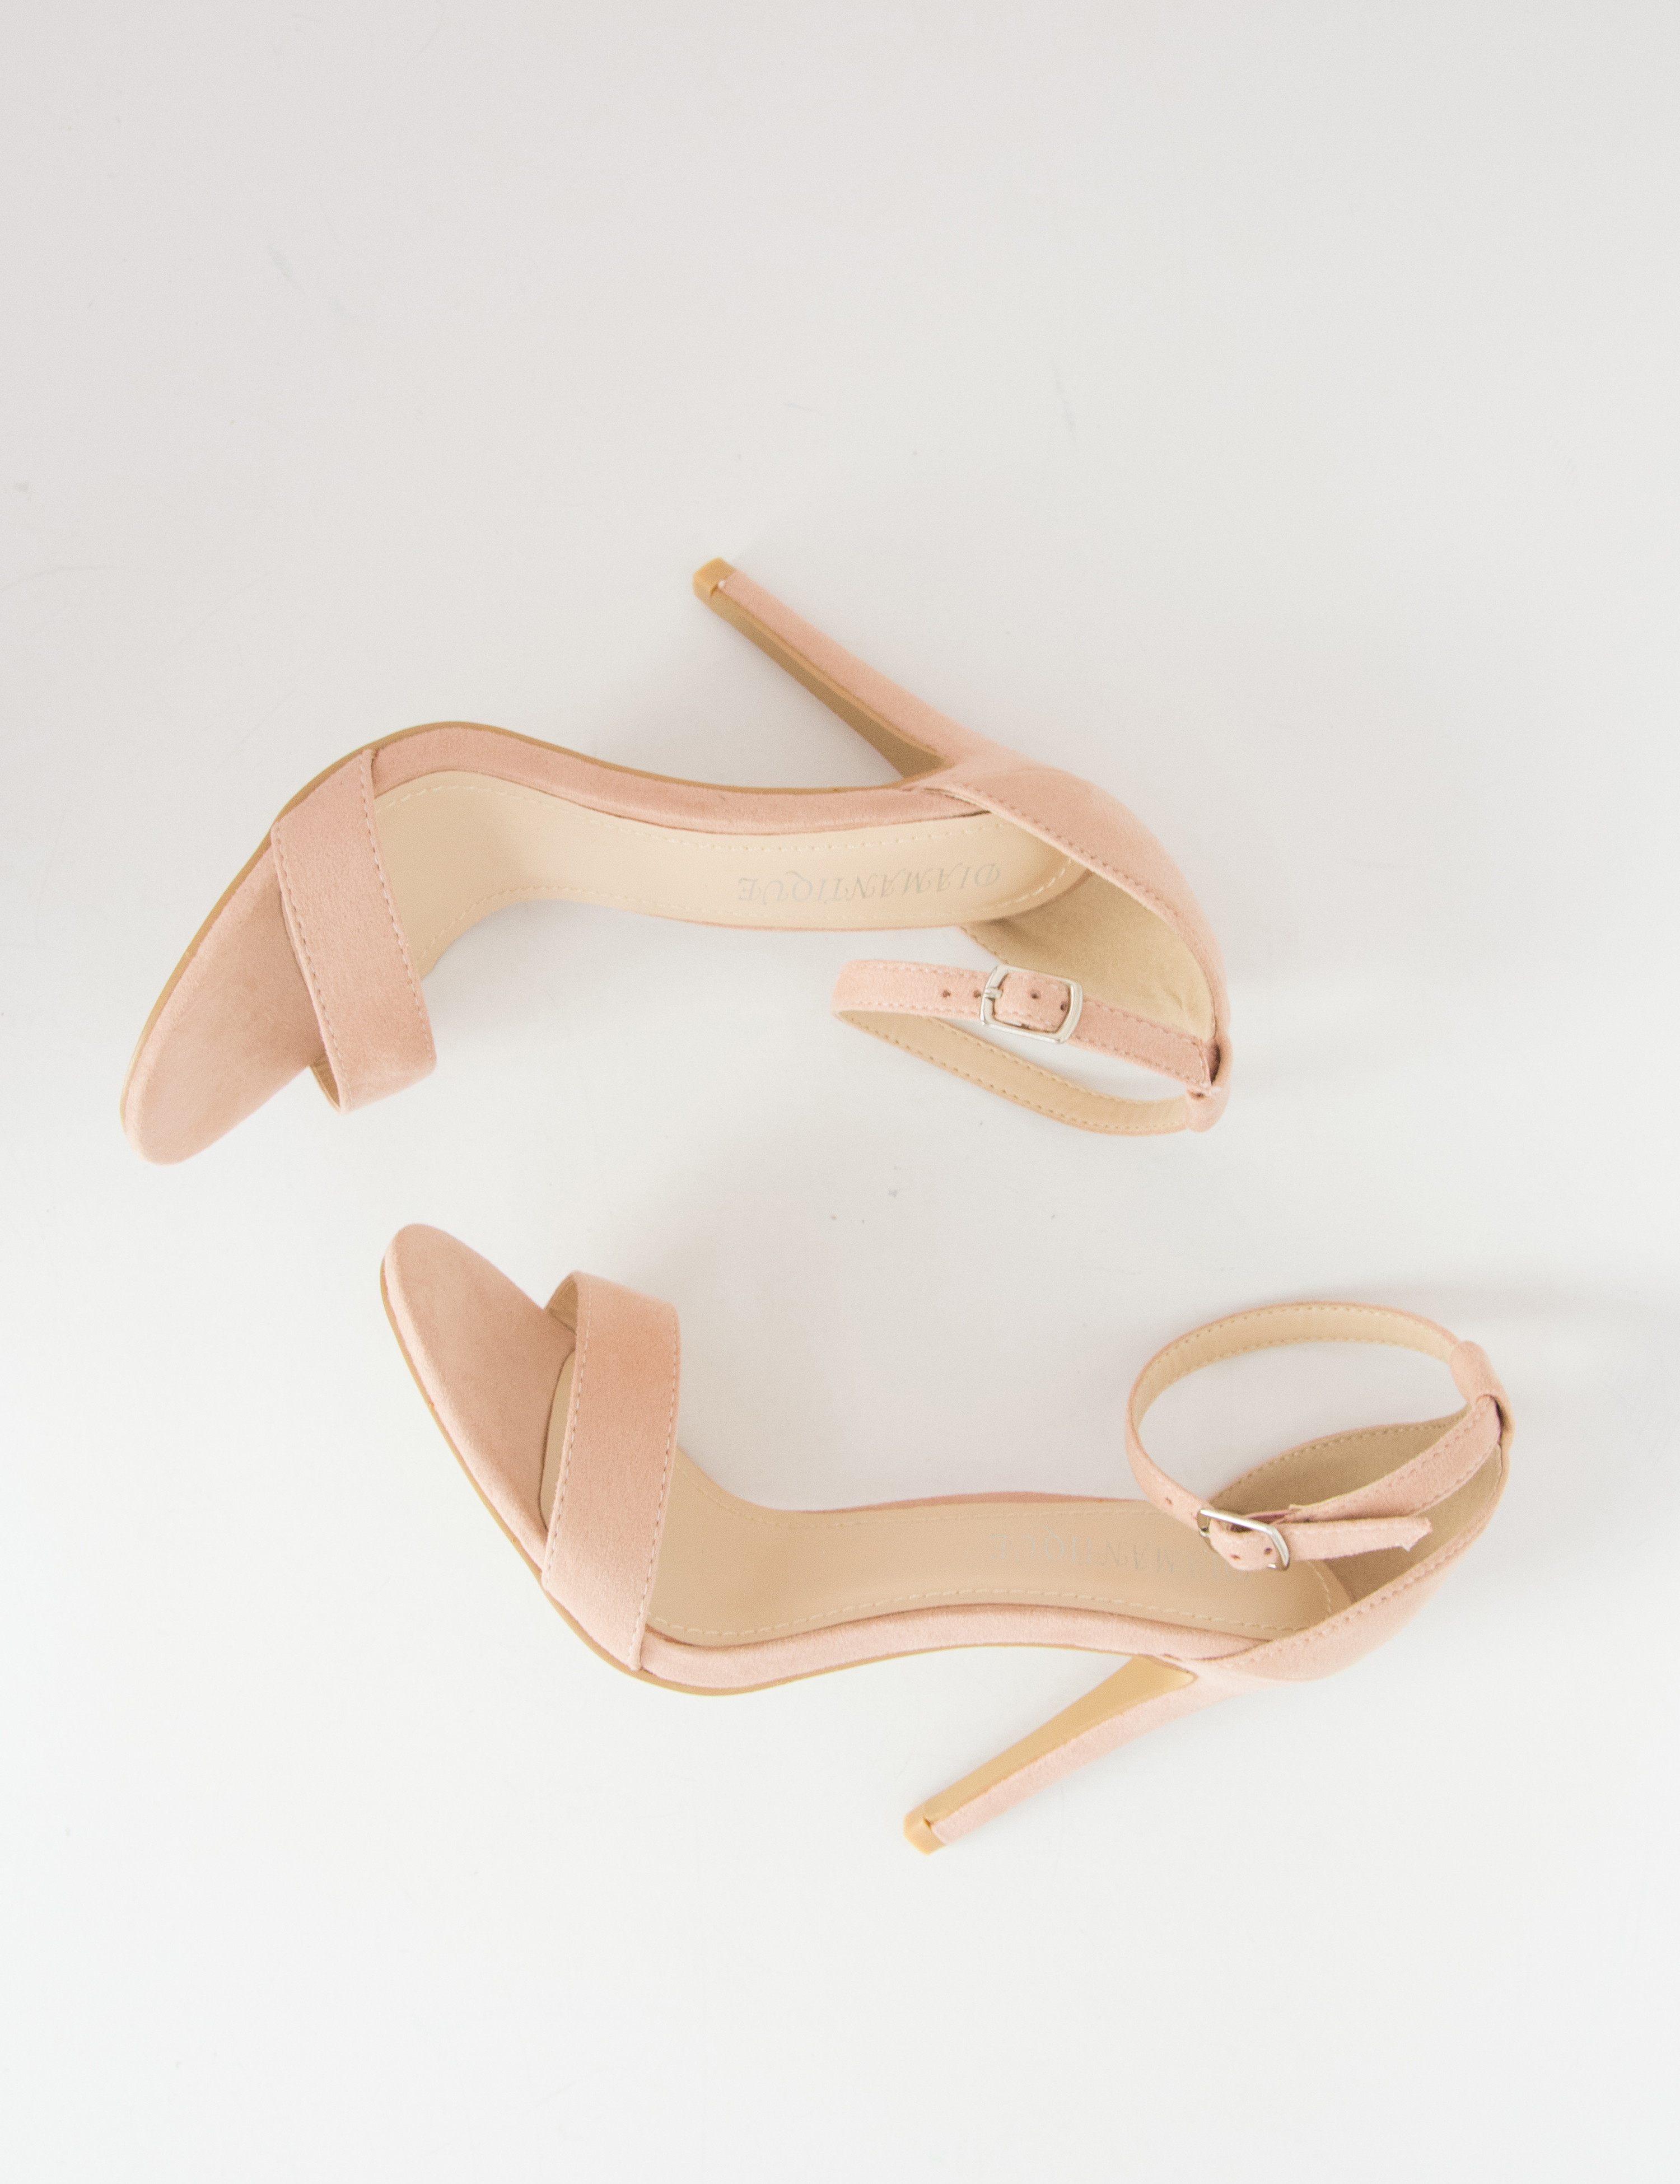 b3e497b036d Κορυφαία προϊόντα για Παπούτσια - Ακριβότερα Προϊόντα - Σελίδα 8803 |  Outfit.gr